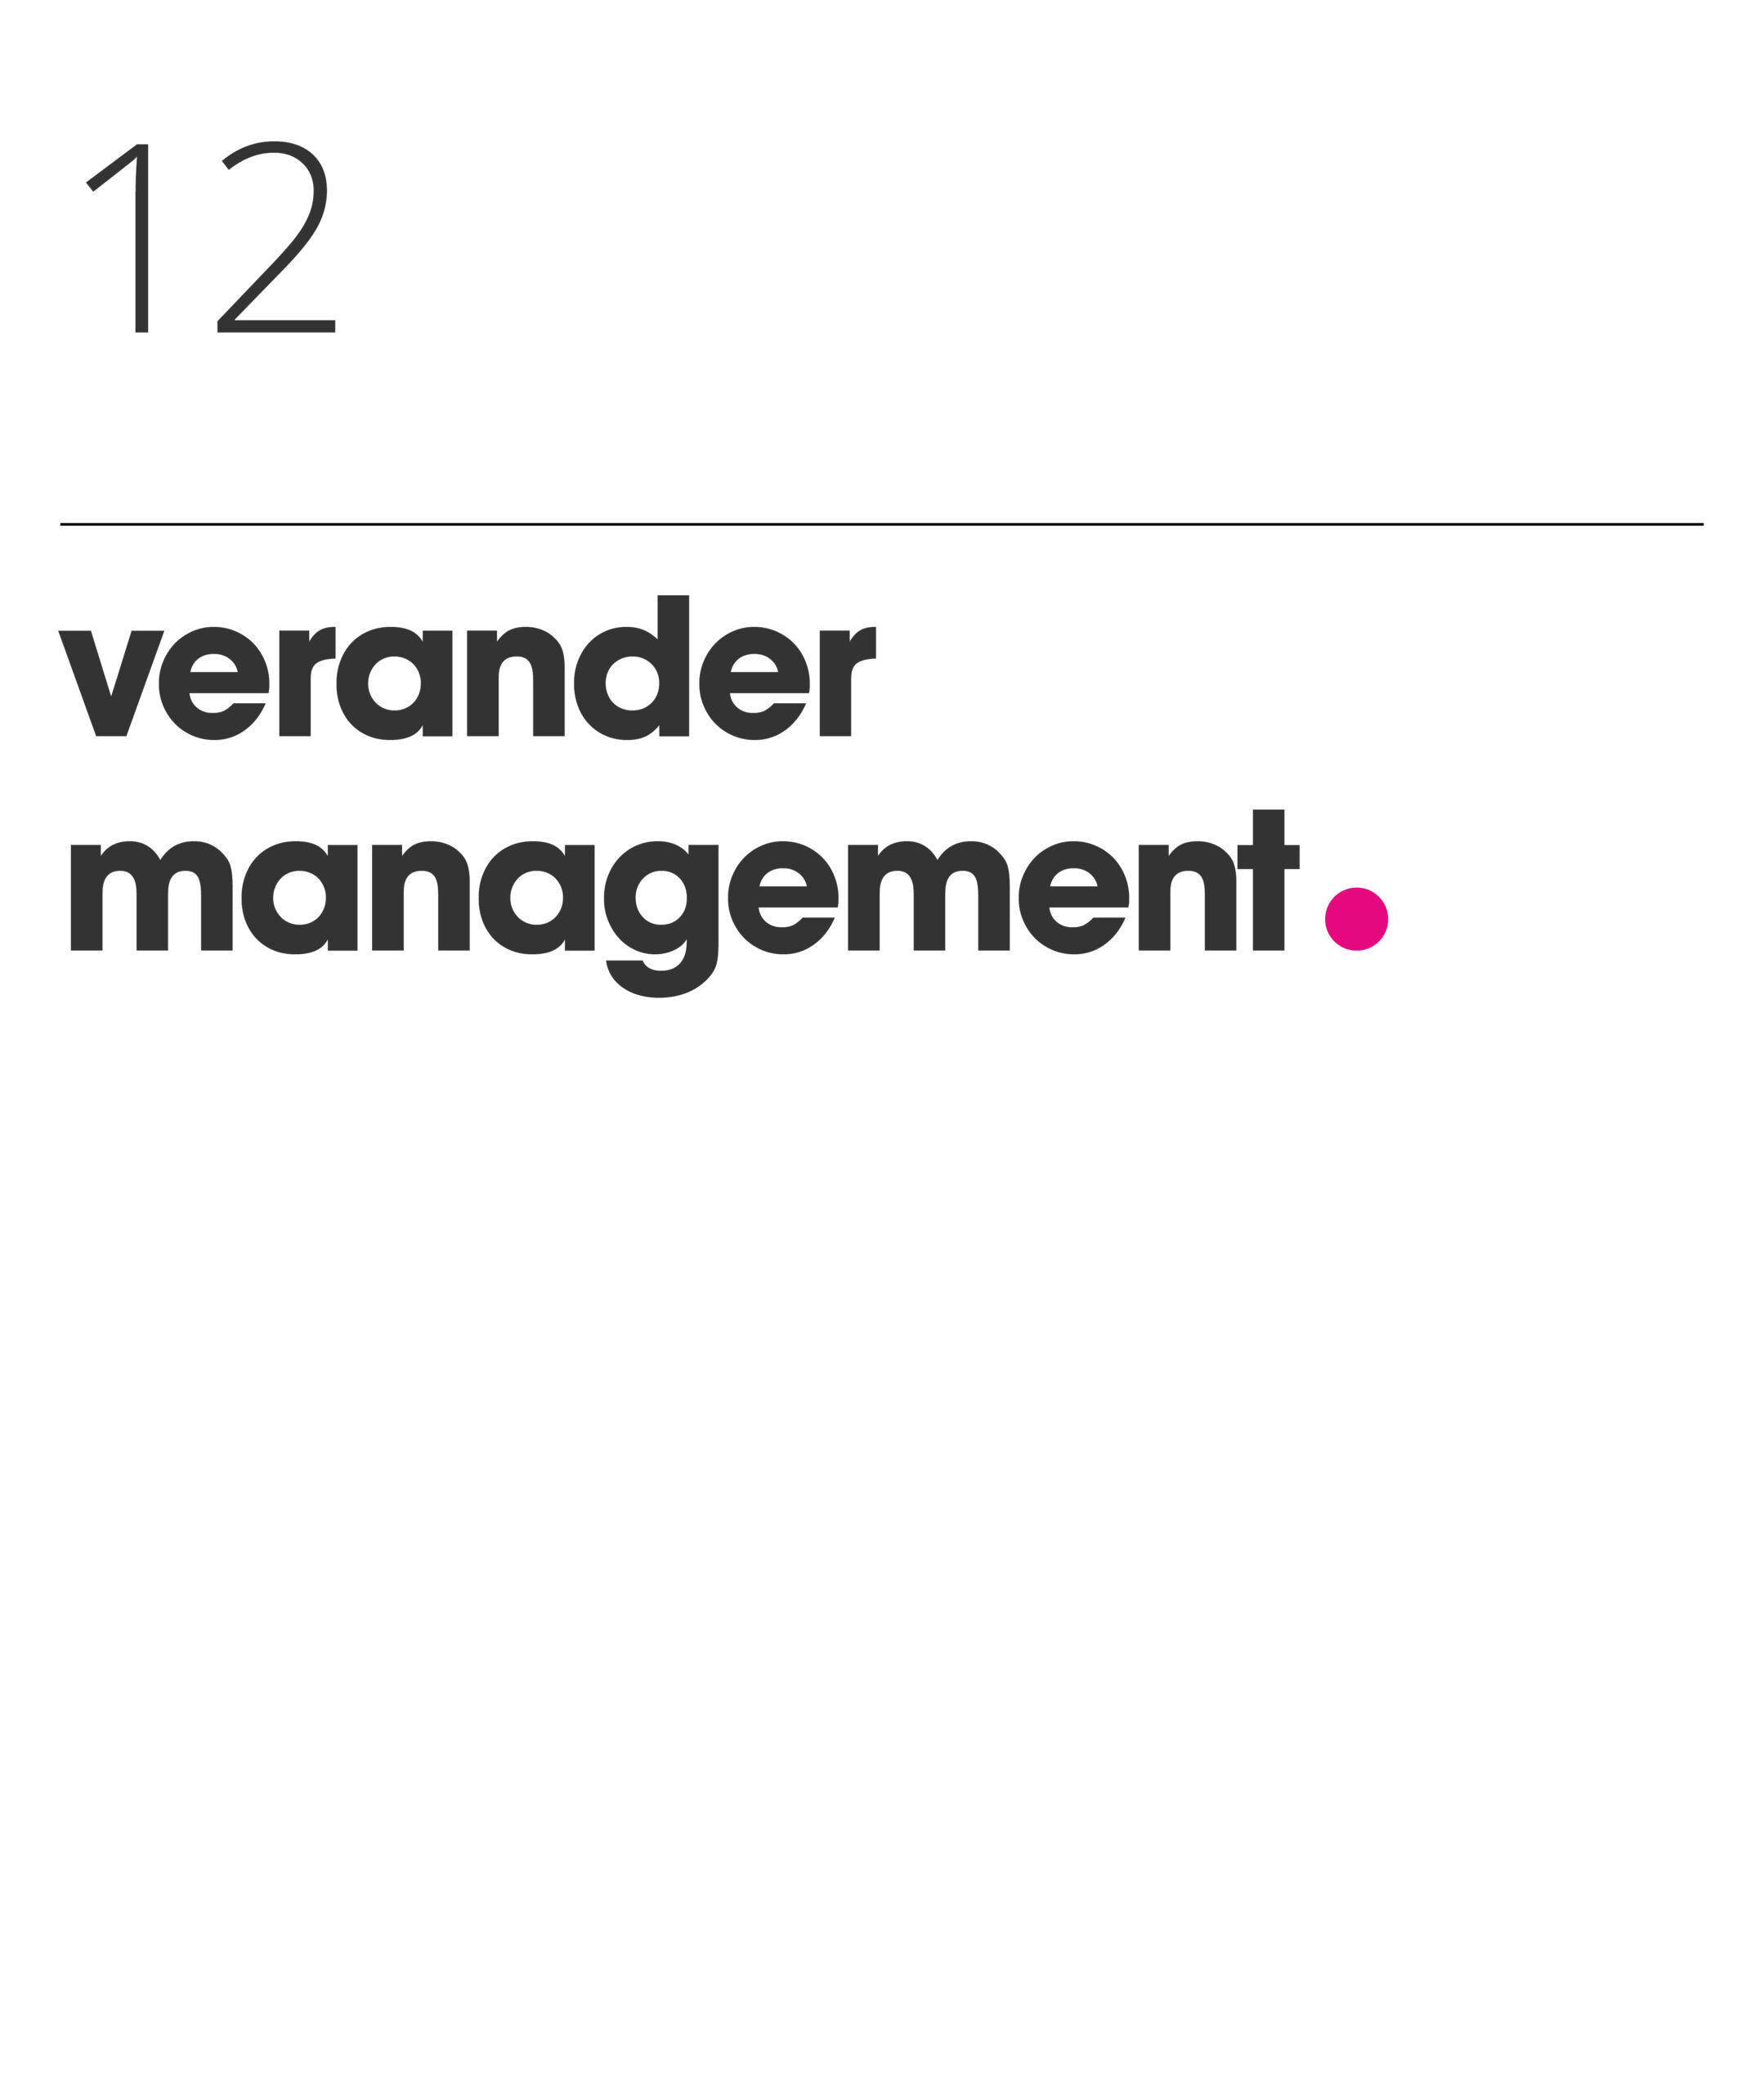 Verander management